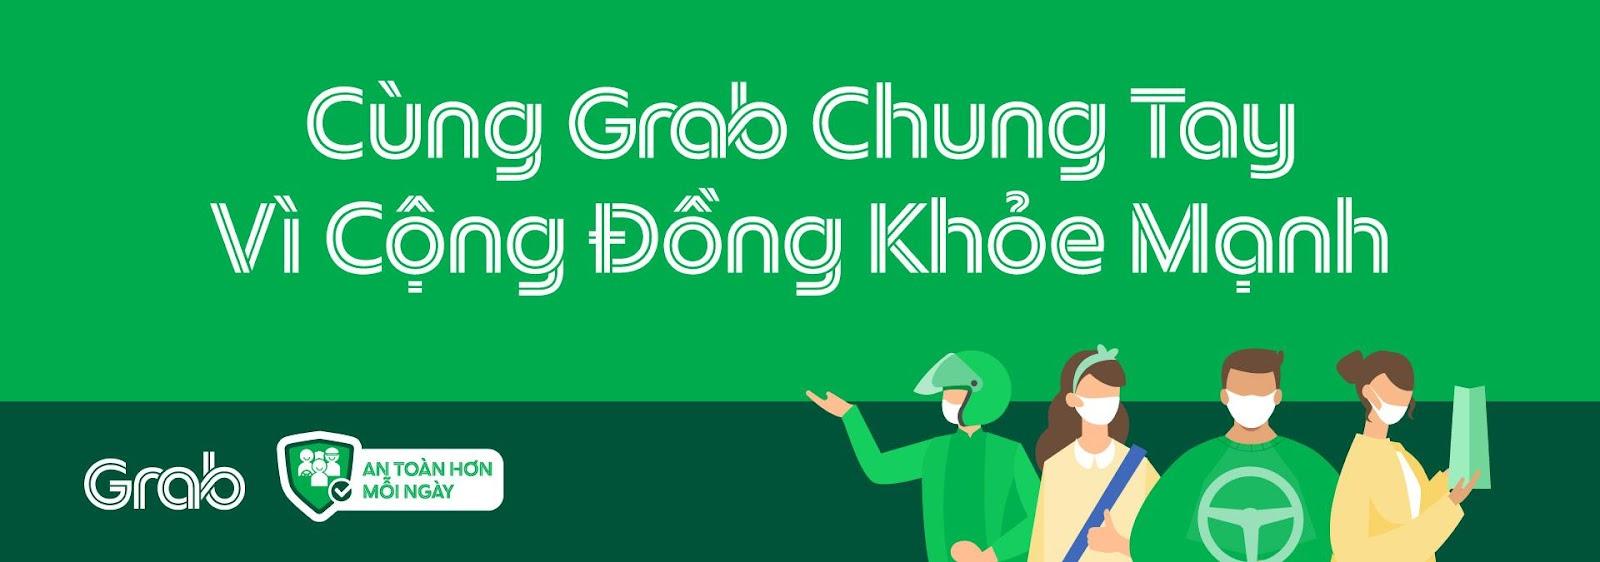 cac-nhan-hang-deu-thay-doi-noi-dung-chien-luoc-marketing-huong-toi-khach-hang